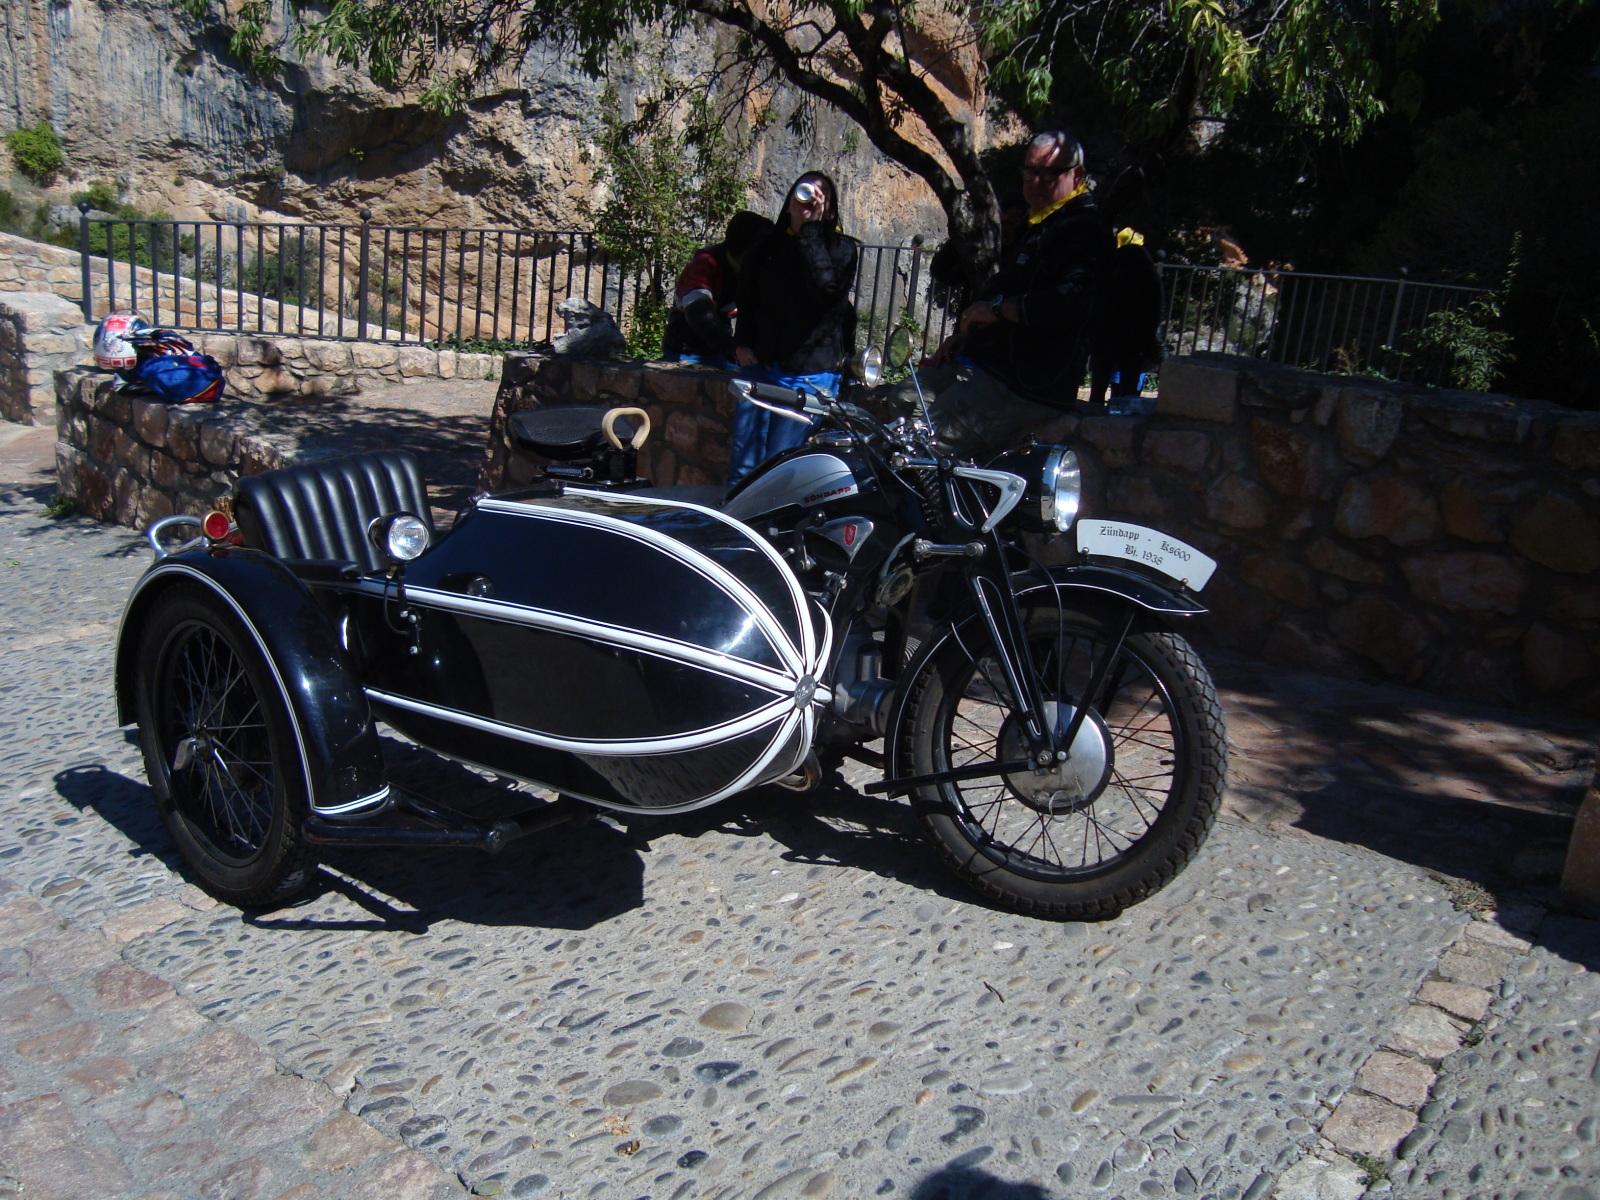 XI concentracion de motos antiguas en Alberuela de tubo (Huesca) Ixt4t2